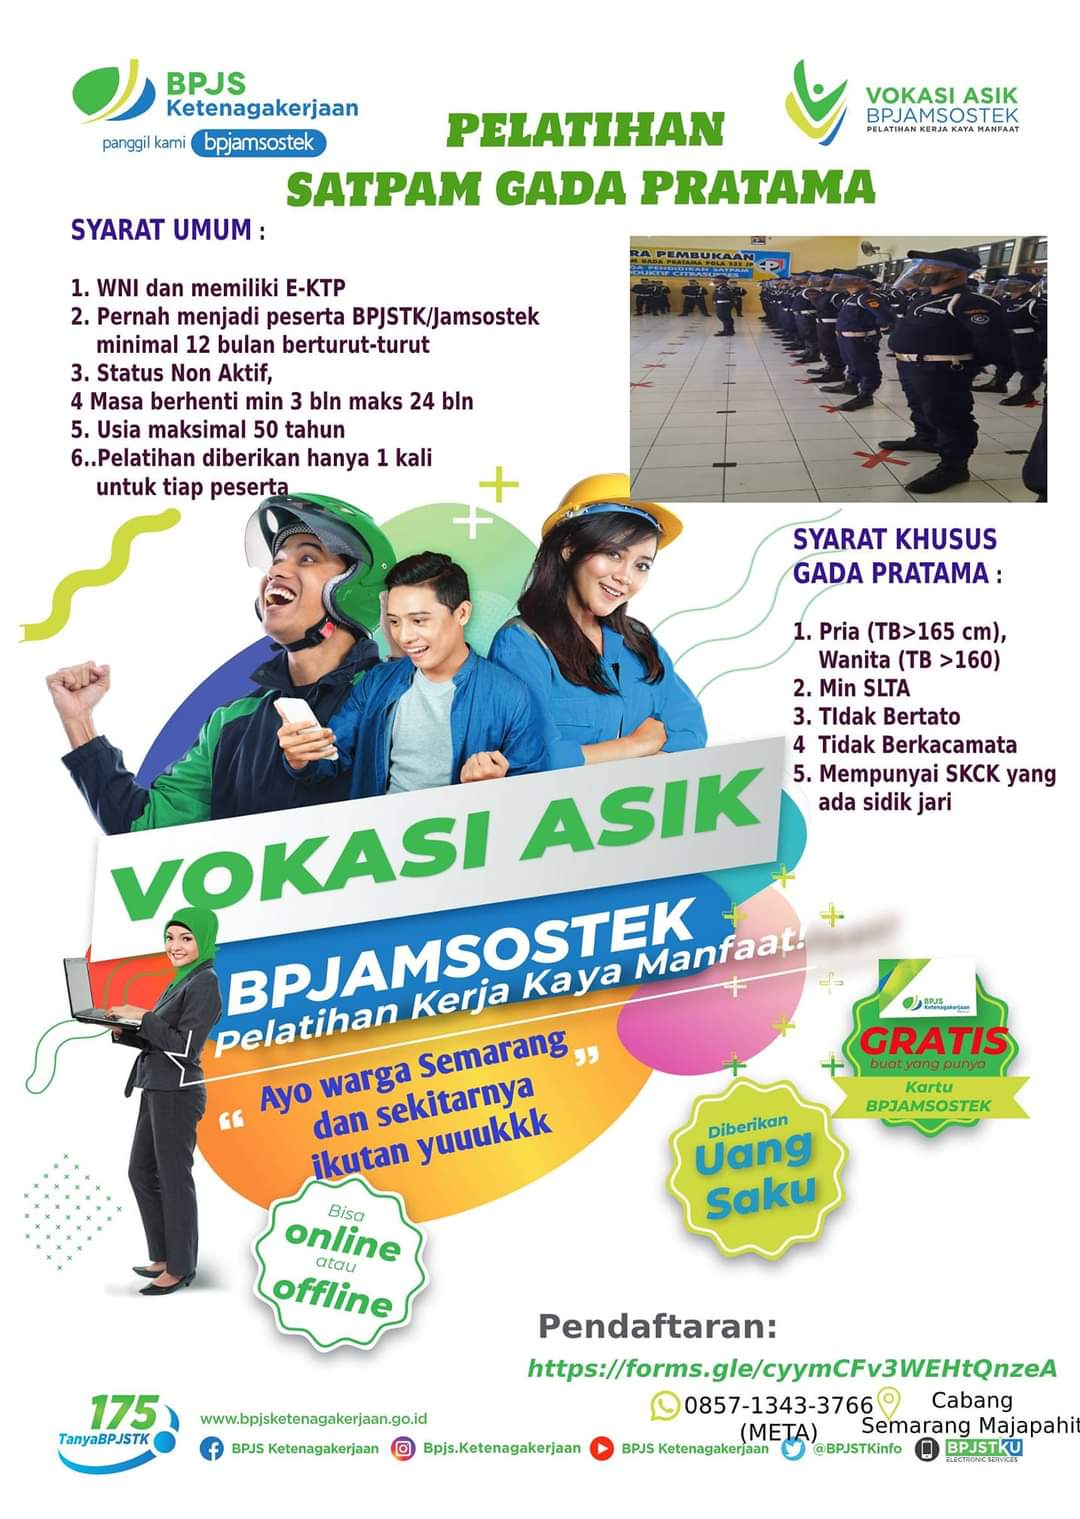 Pelatihan Security Gada Pratama GRATIS Program Vokasi BPJamsostek Semarang Majapahit